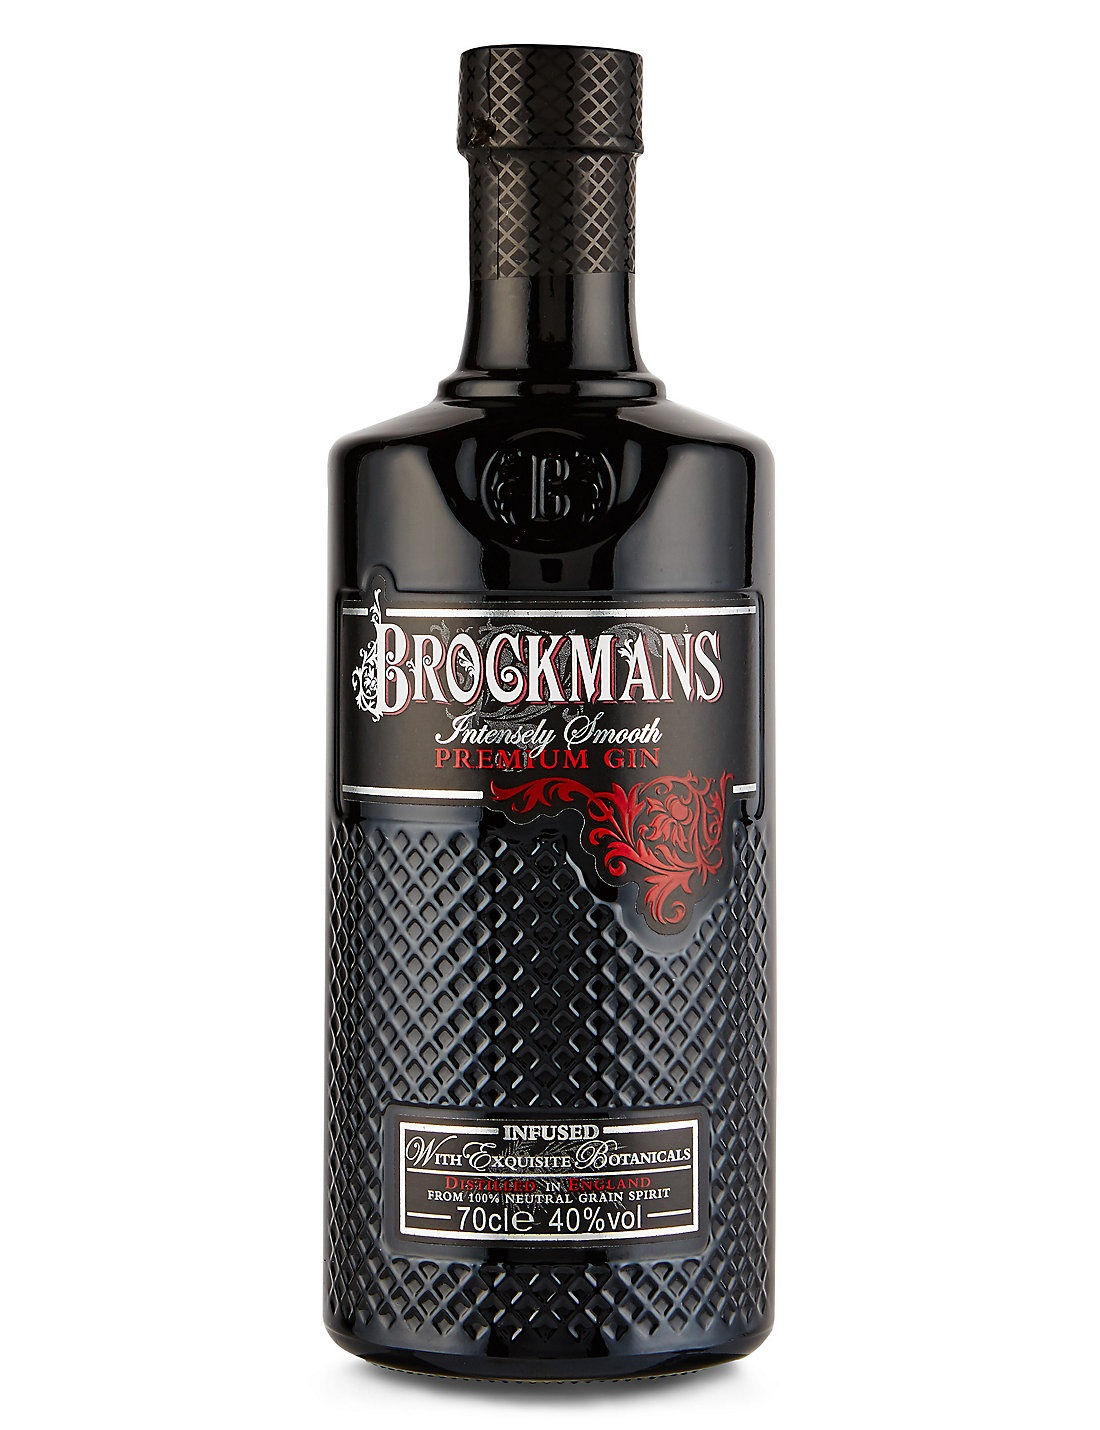 BROCKMANS COMPOUND GIR